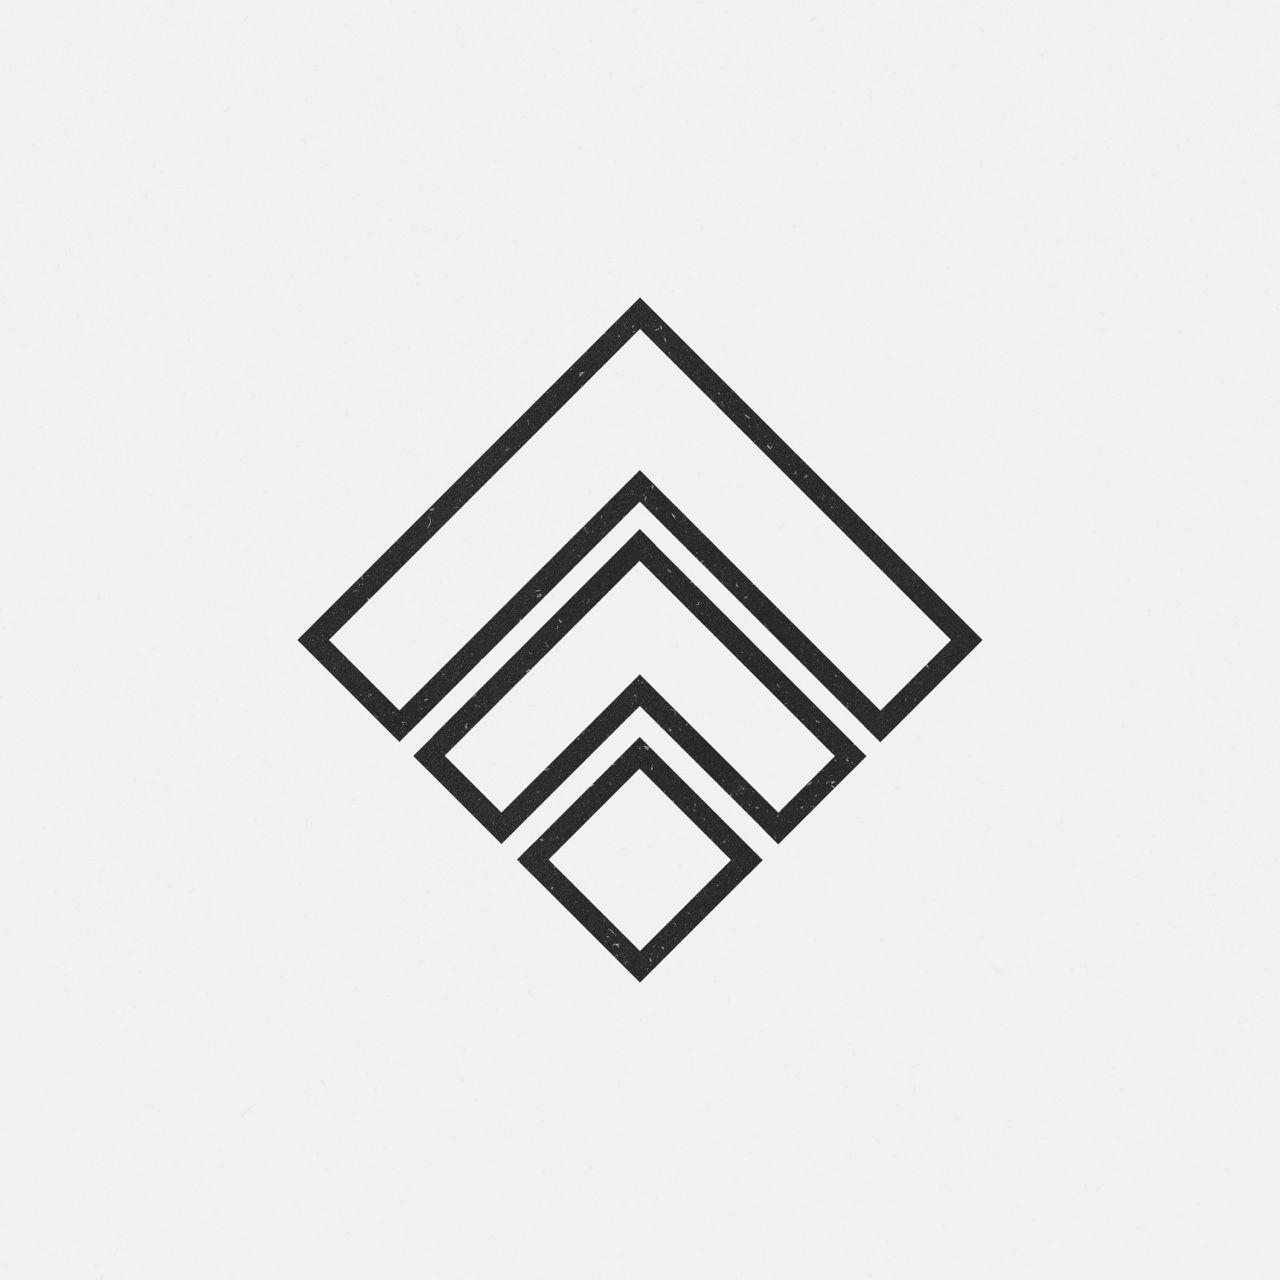 Fe16 494 A New Geometric Design Every Day My Tattoo Favorite Origamidragondiagram021png 512x512 Best Origami Pinterest